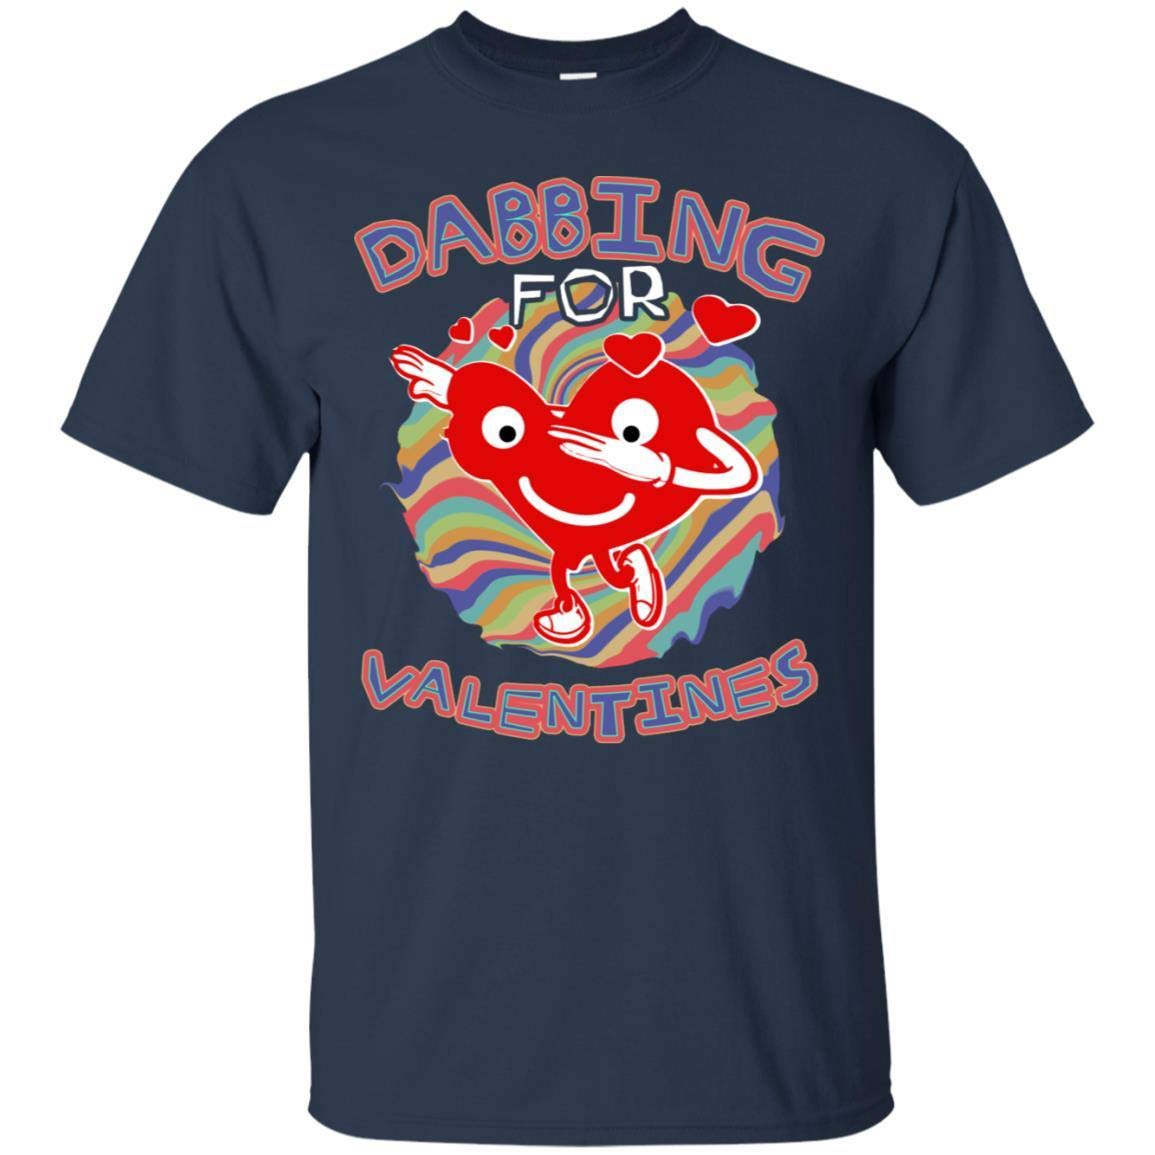 Teelesto Dabbing for Valentines Shirt